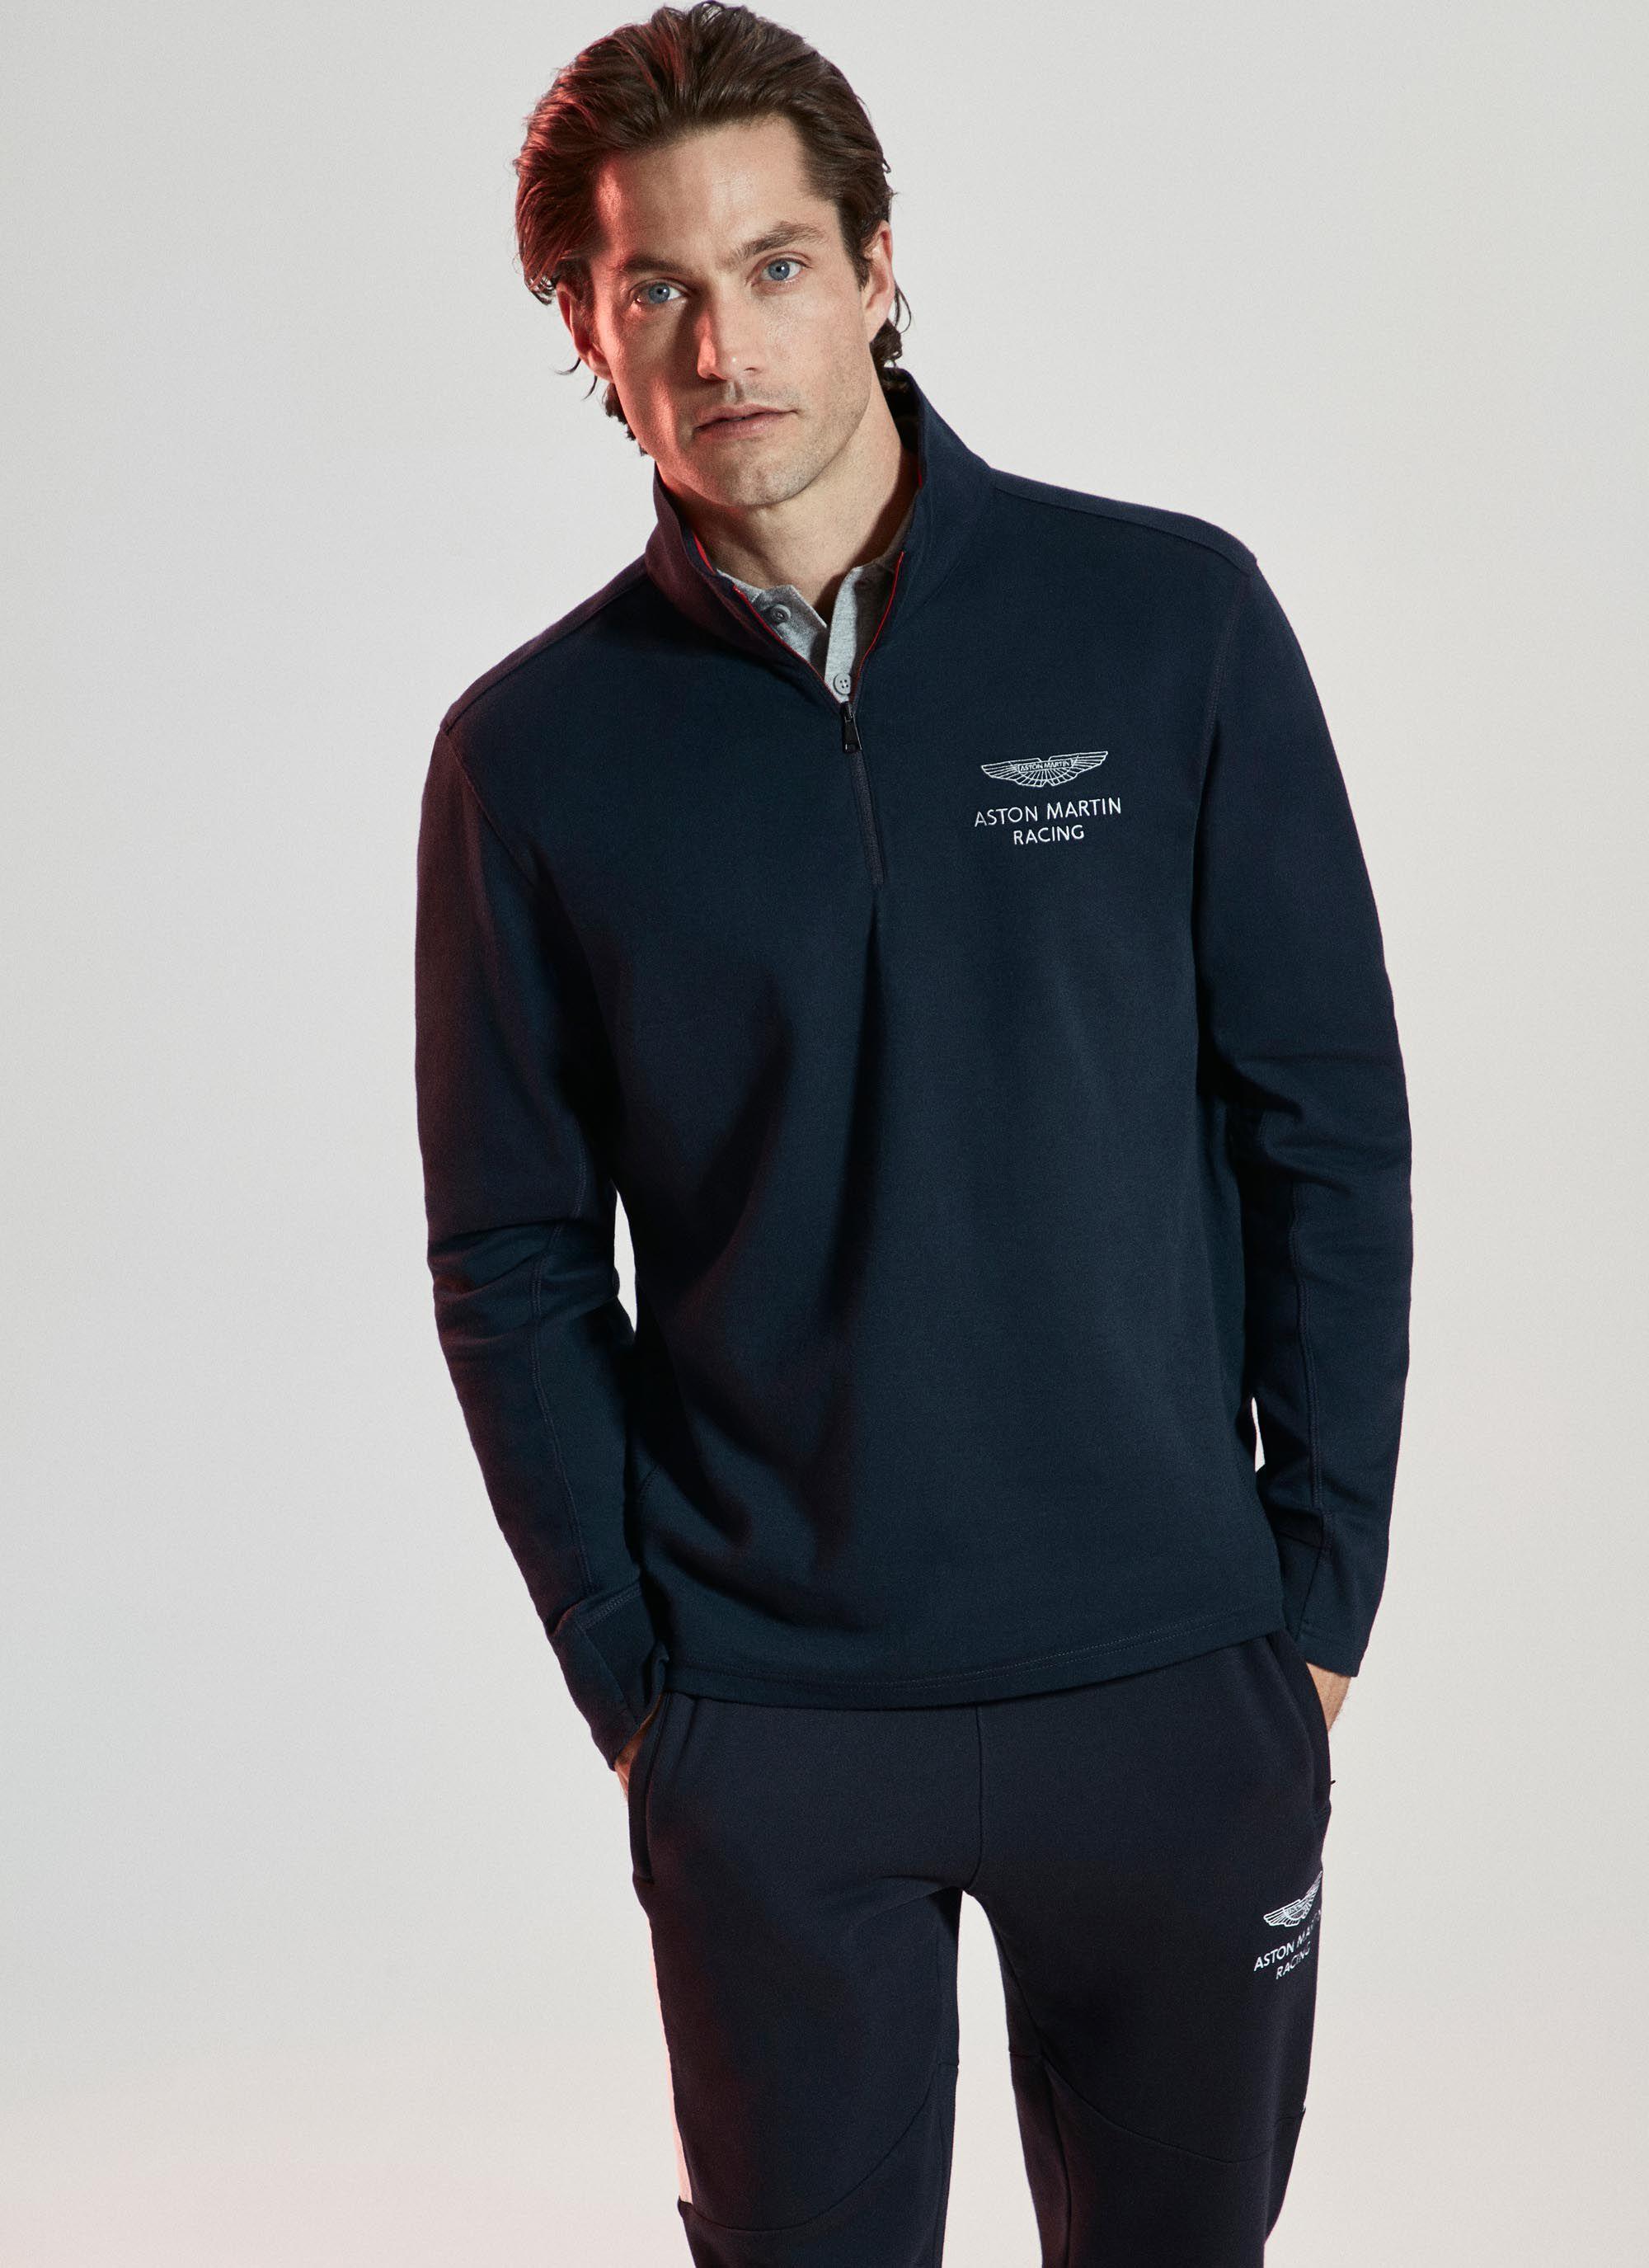 aston martin racing men's cotton jersey half zip sweater | x-small | navy